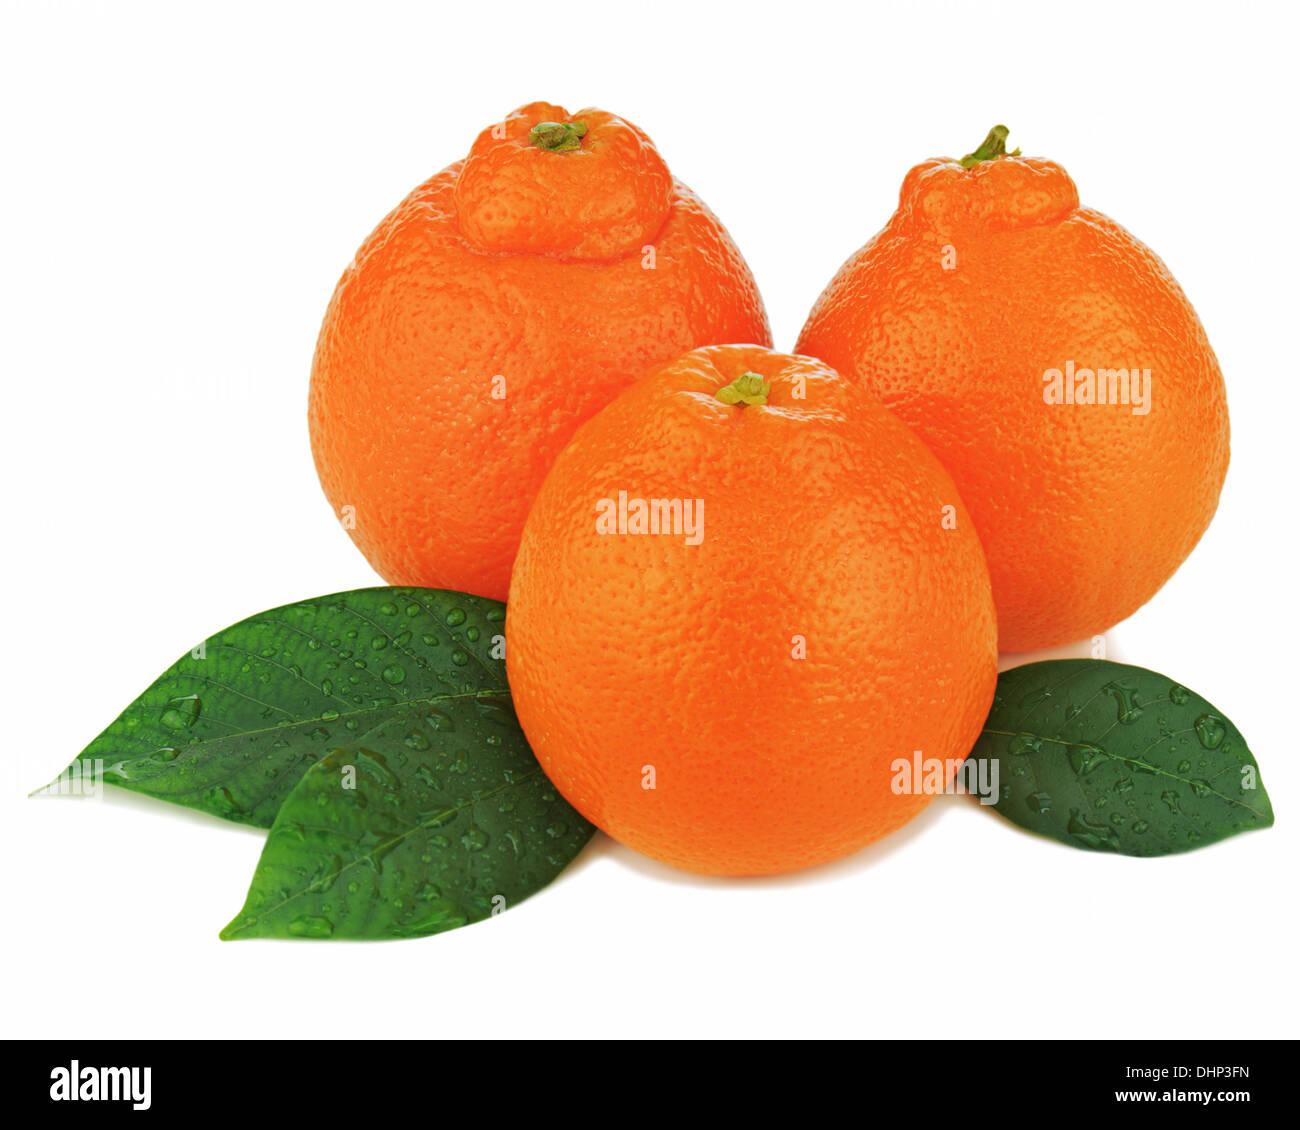 Ripe mineola fruits with green leaves isolated on white background. - Stock Image